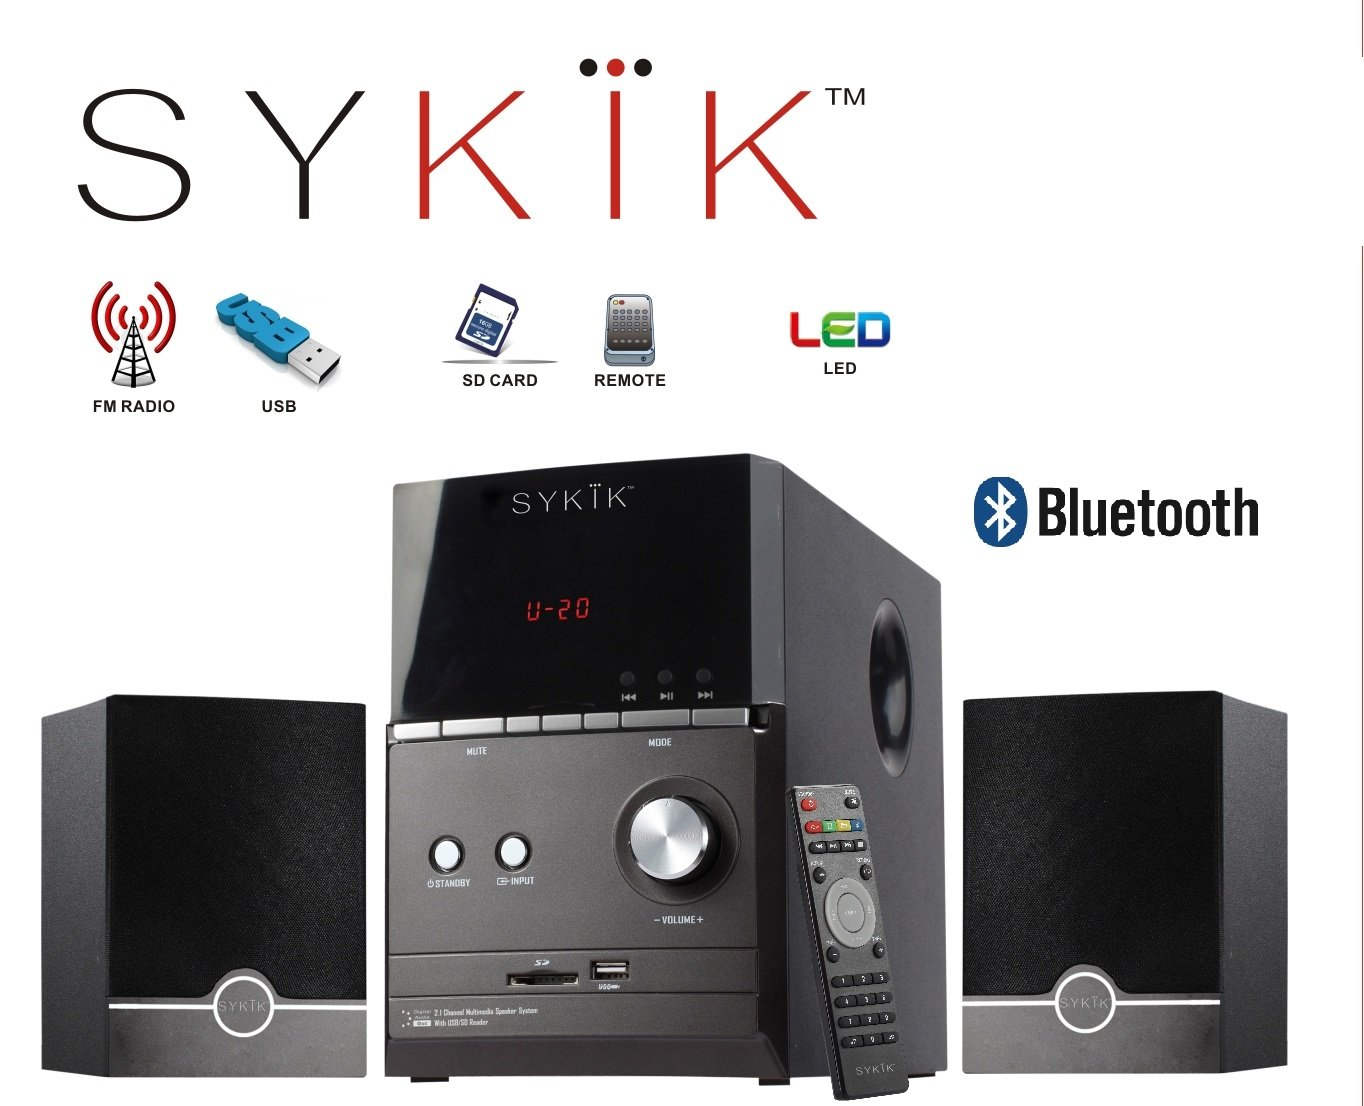 Sykik Sound SPME51 SD Powerful Bluetooth Sound System with 5 Sub-Woofer Remote and FM Radio USB